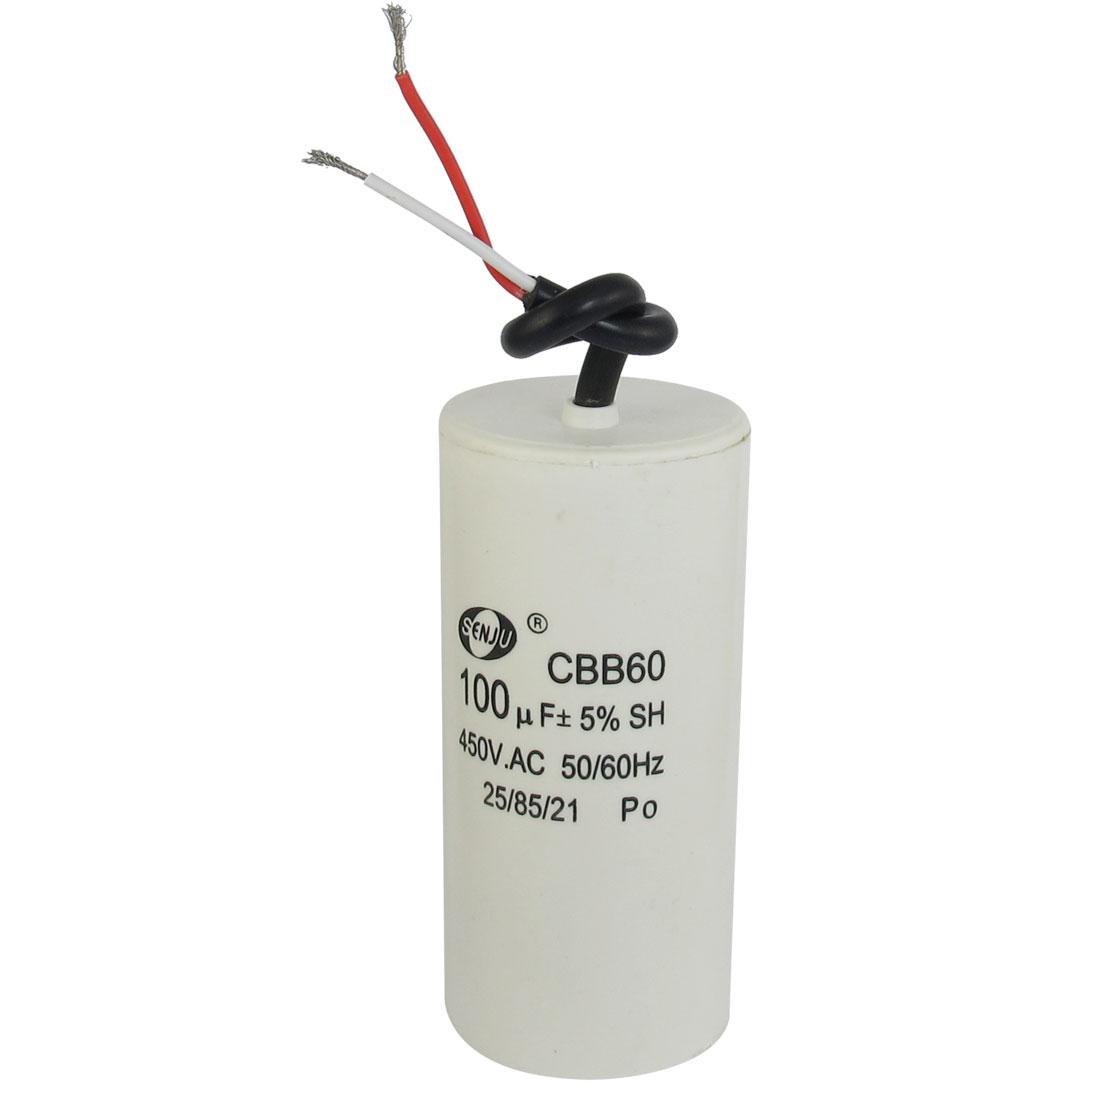 CBB60 AC 450V 100uF Cylindrical Non Polar Motor Capacitor